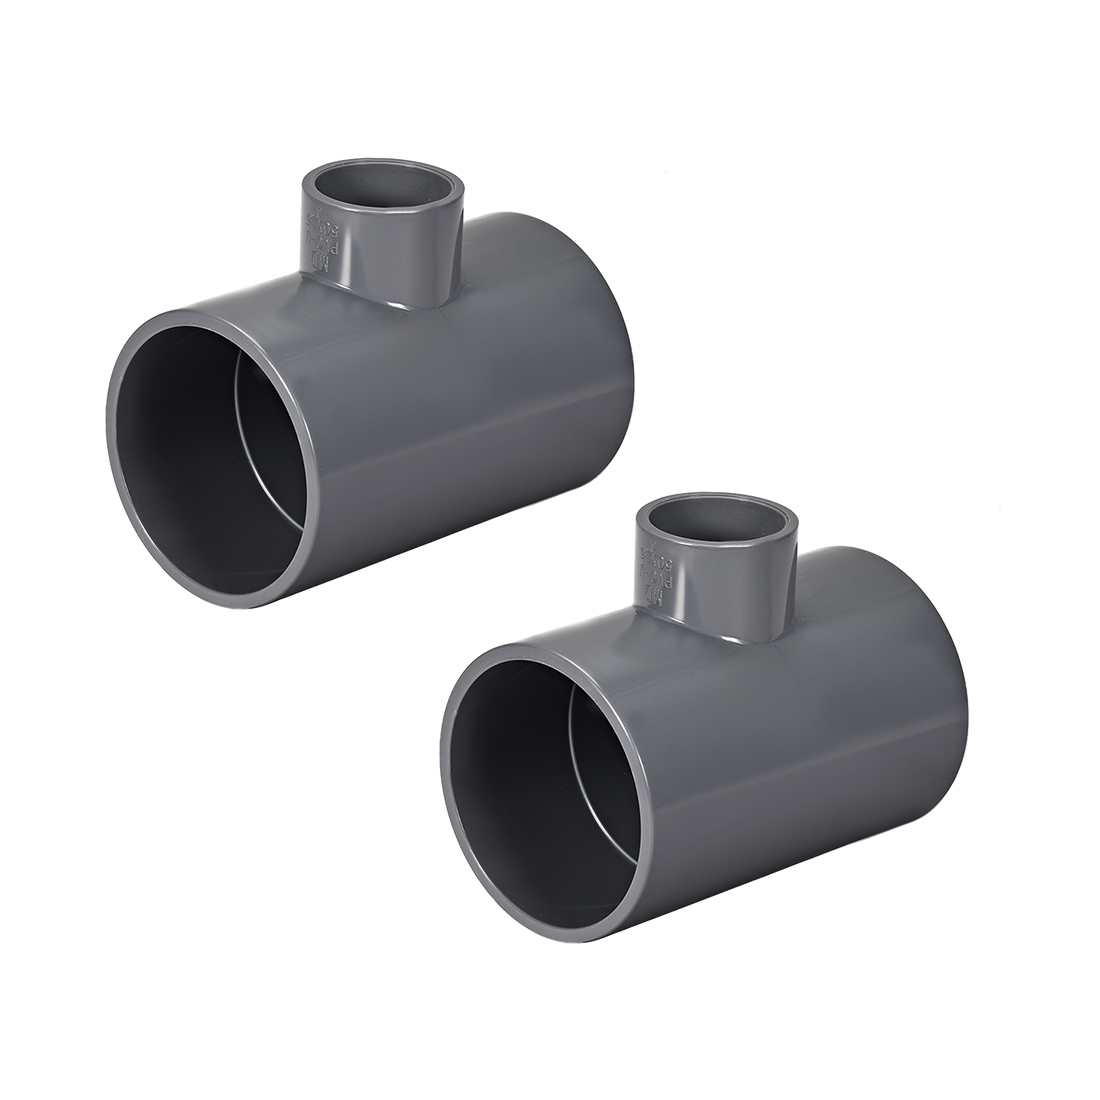 PVC Pipe Fitting Tee 401-Series Gray 1-inch X 2-inch Socket 2pcs